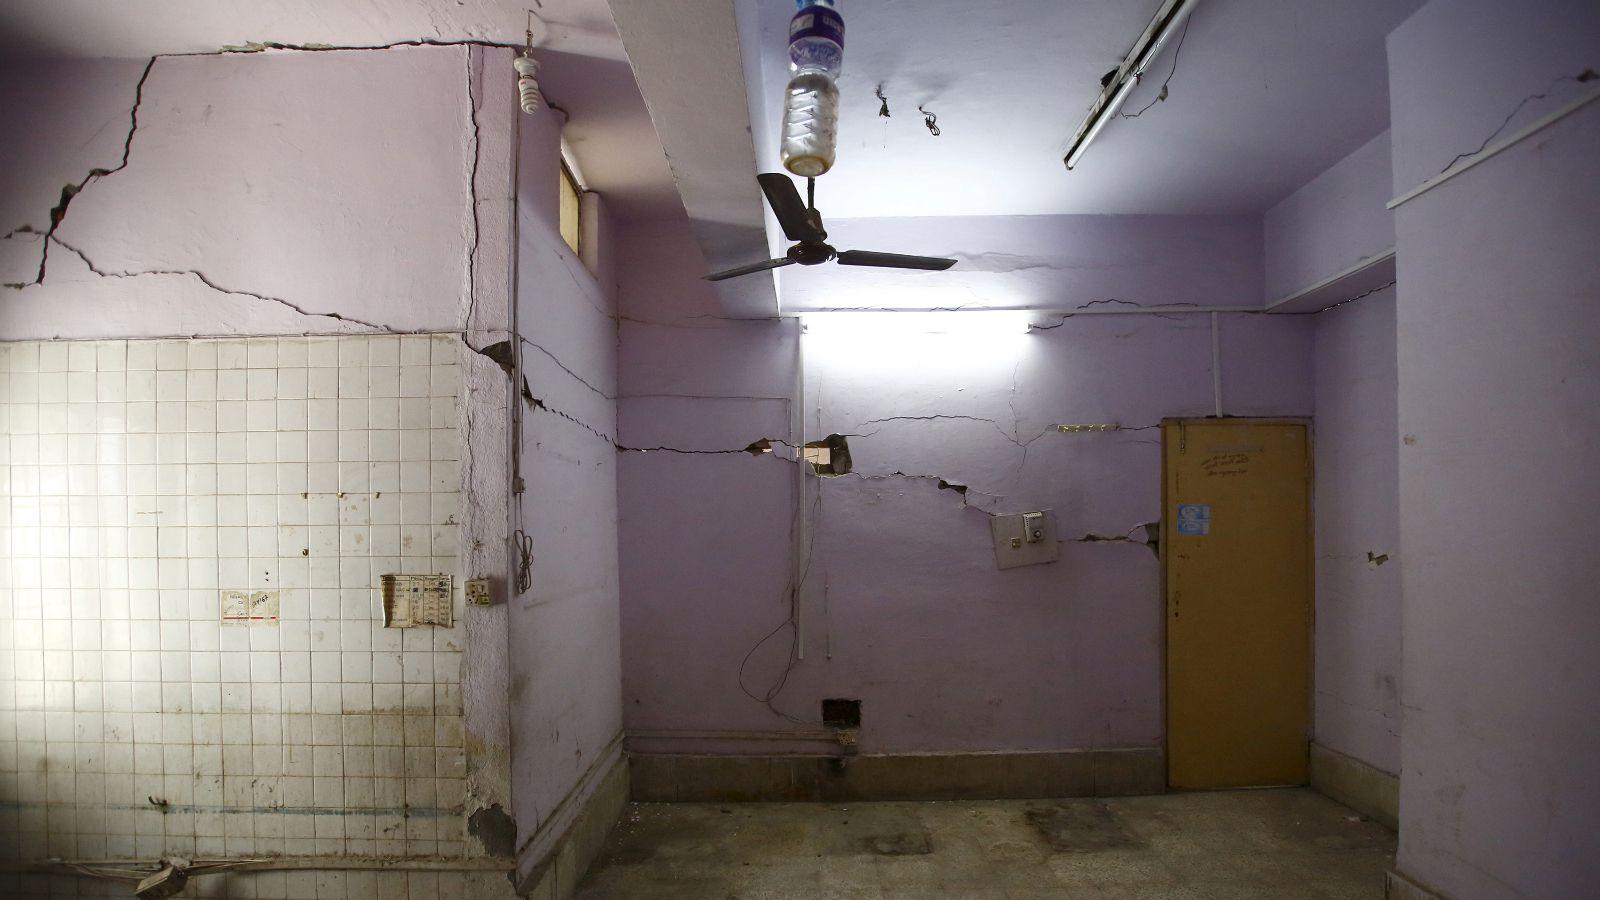 Nepal-Earthquake-Hospital-Healthcare